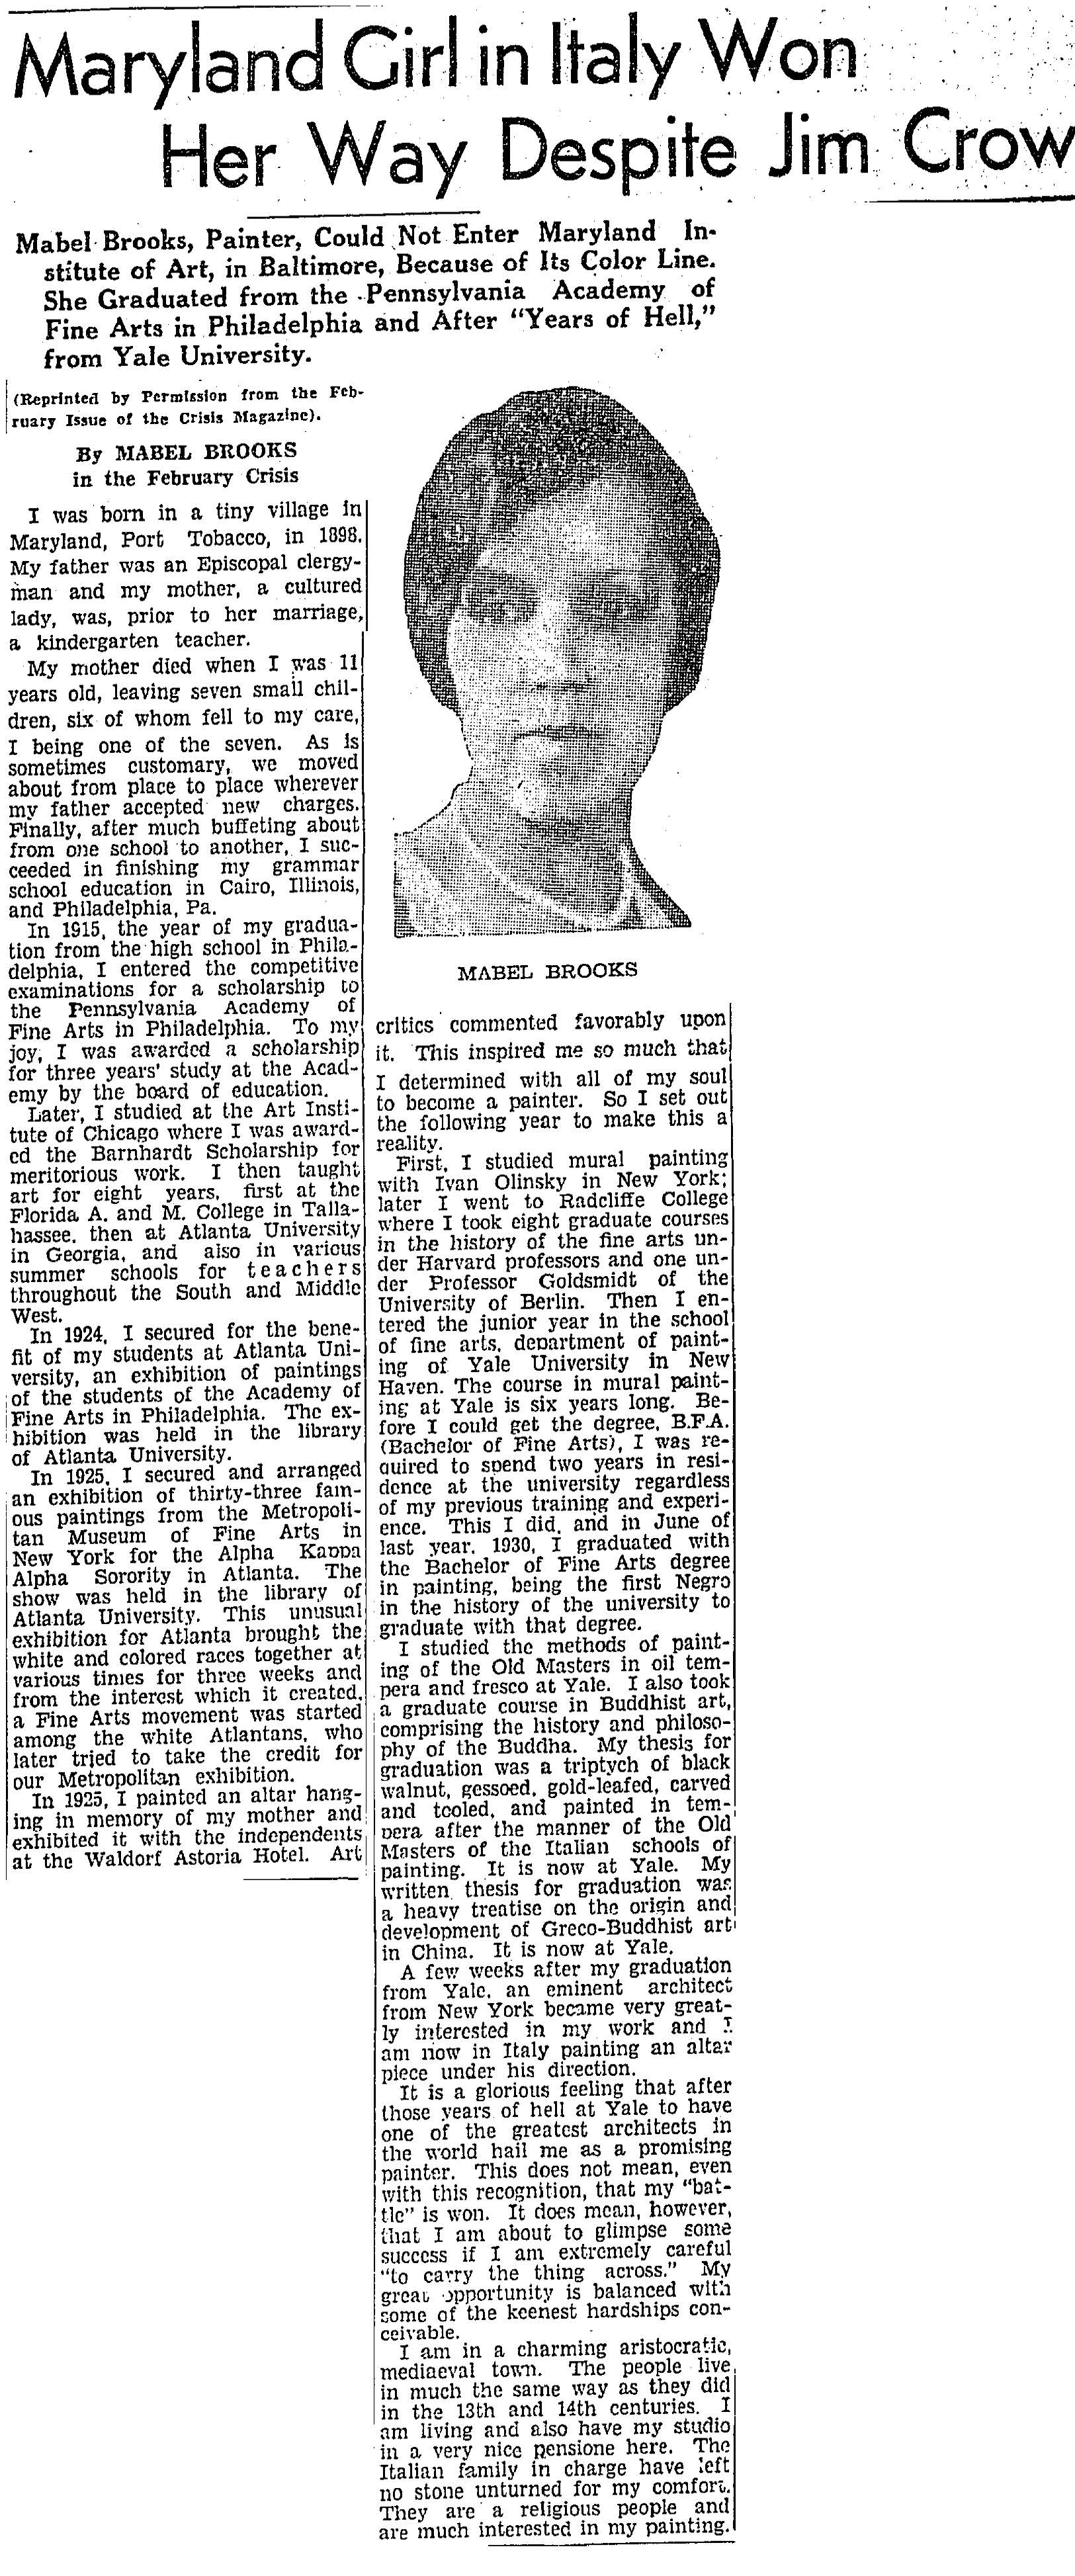 1932-5-7-Maryland_Girl_in_Italy_Won_Her.jpg